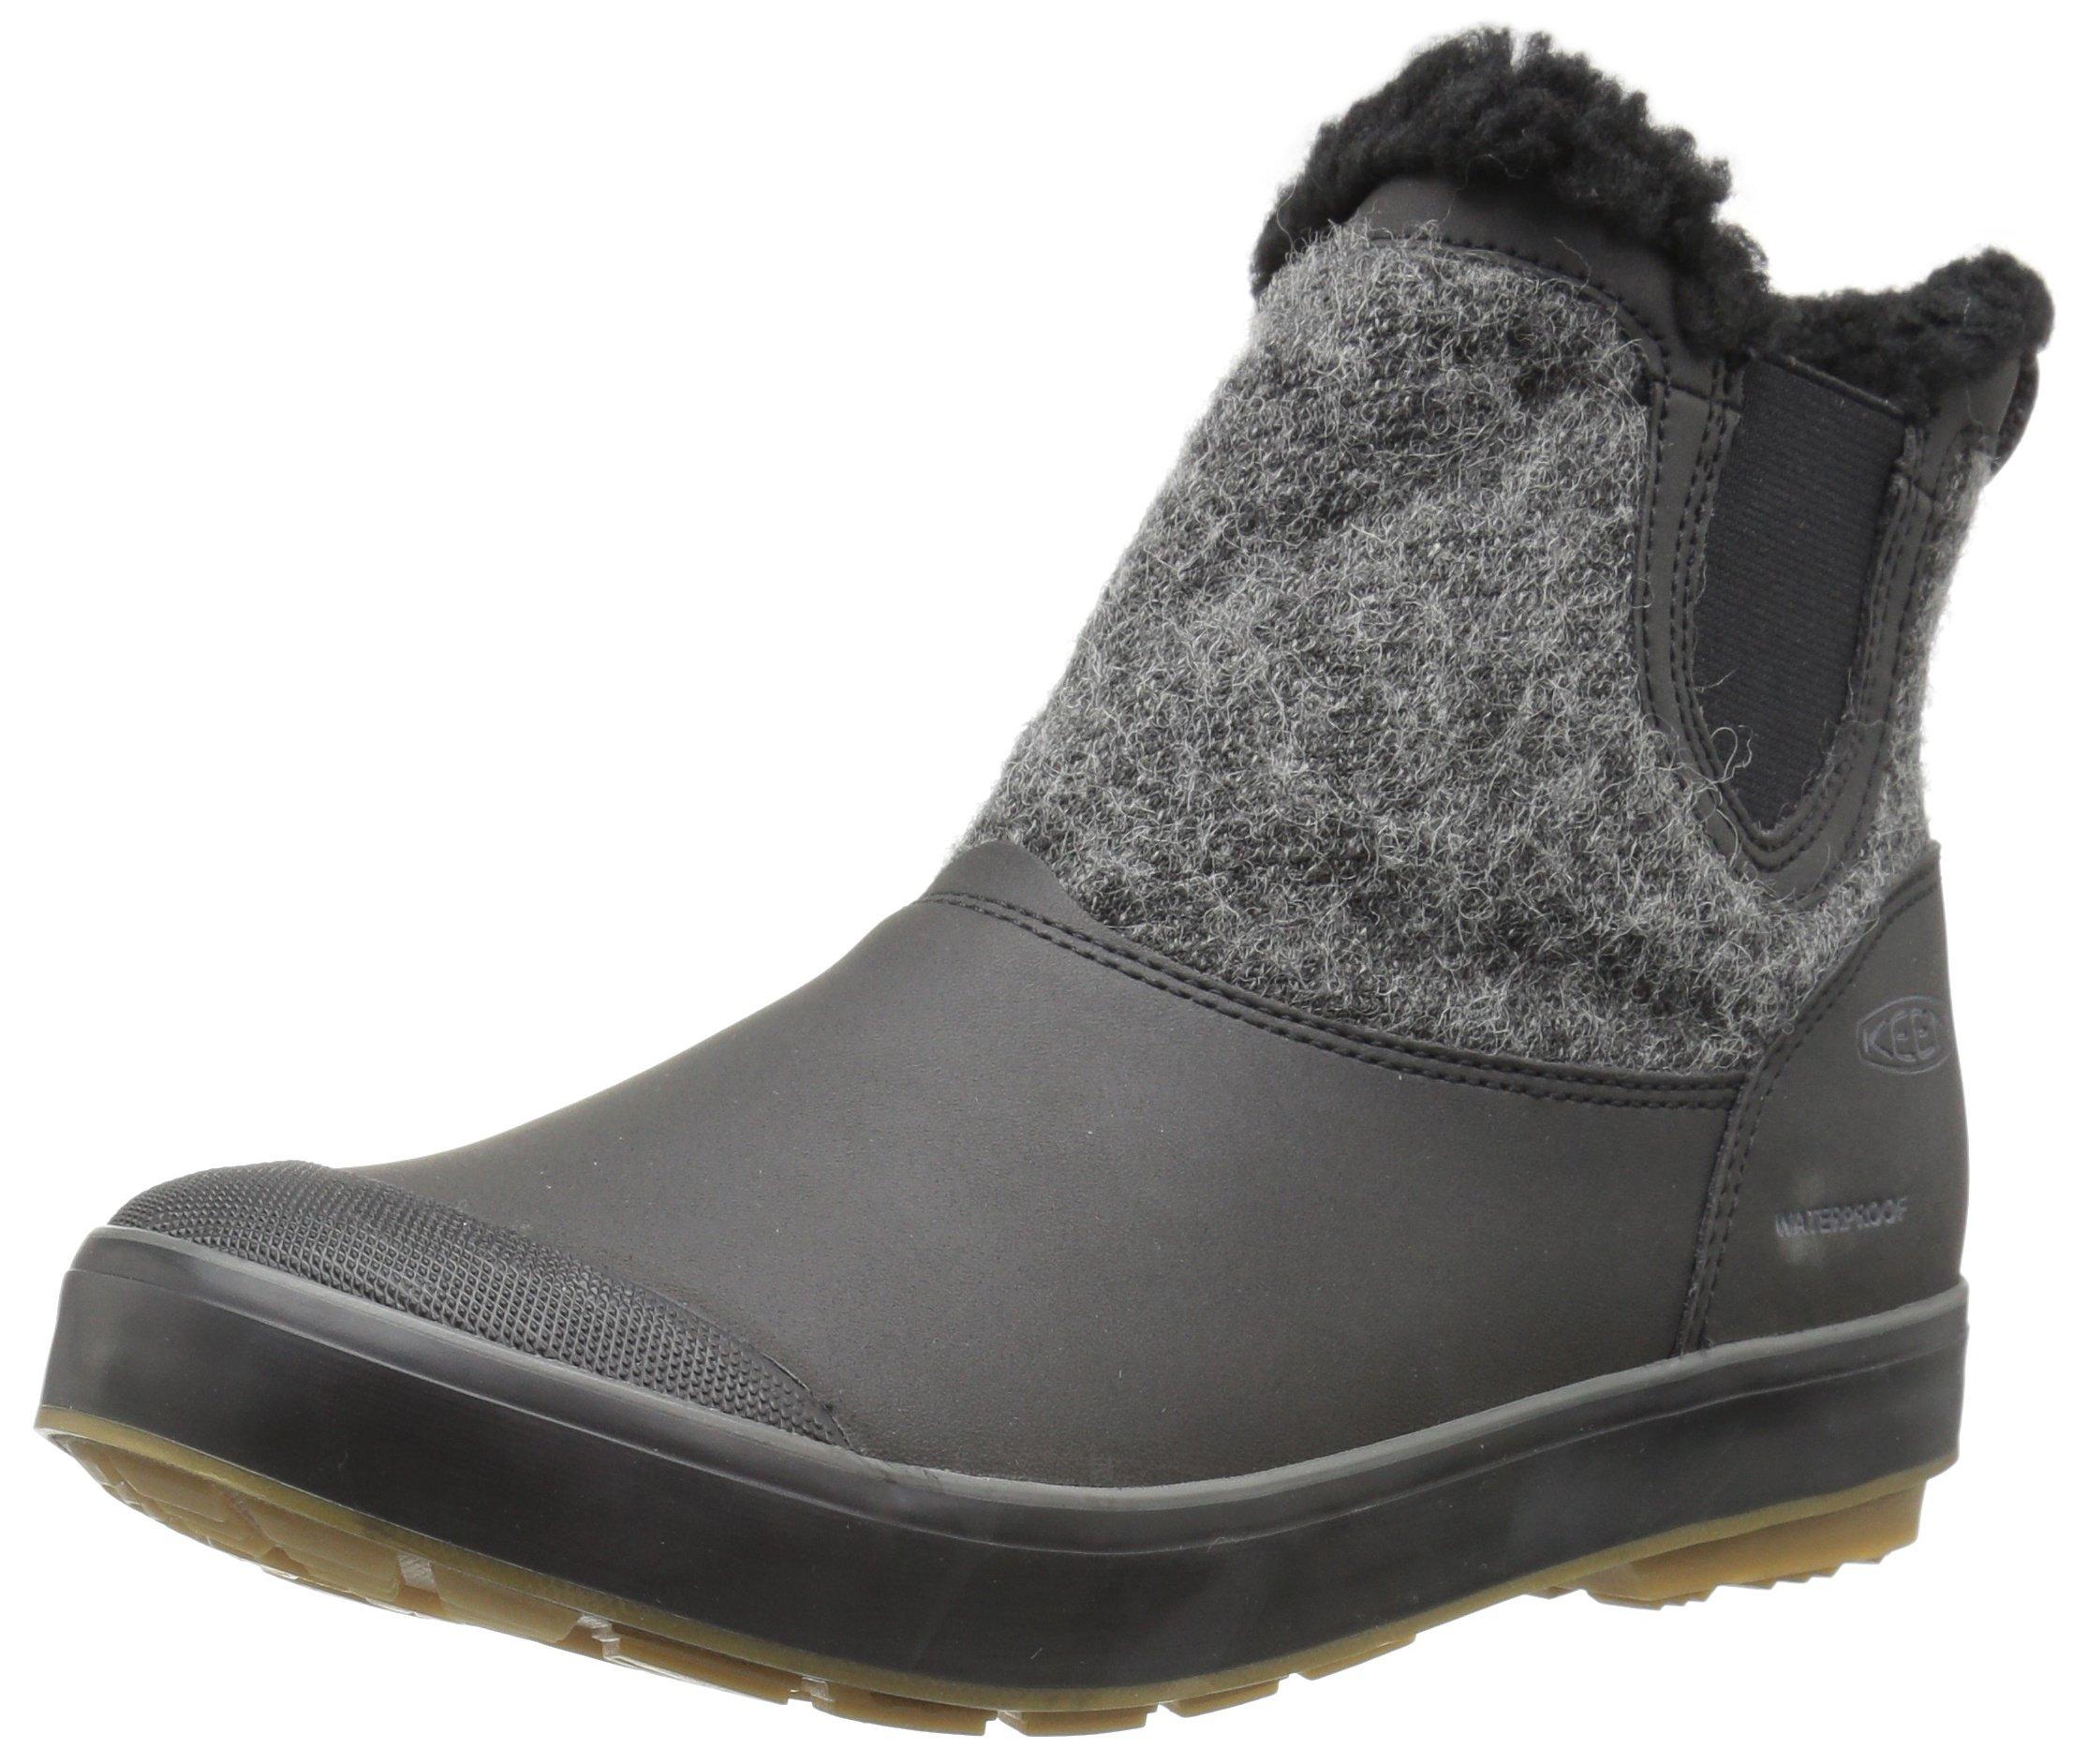 KEEN Women's Elsa Chelsea WP-w Snow Boot, Black Wool, 10 M US